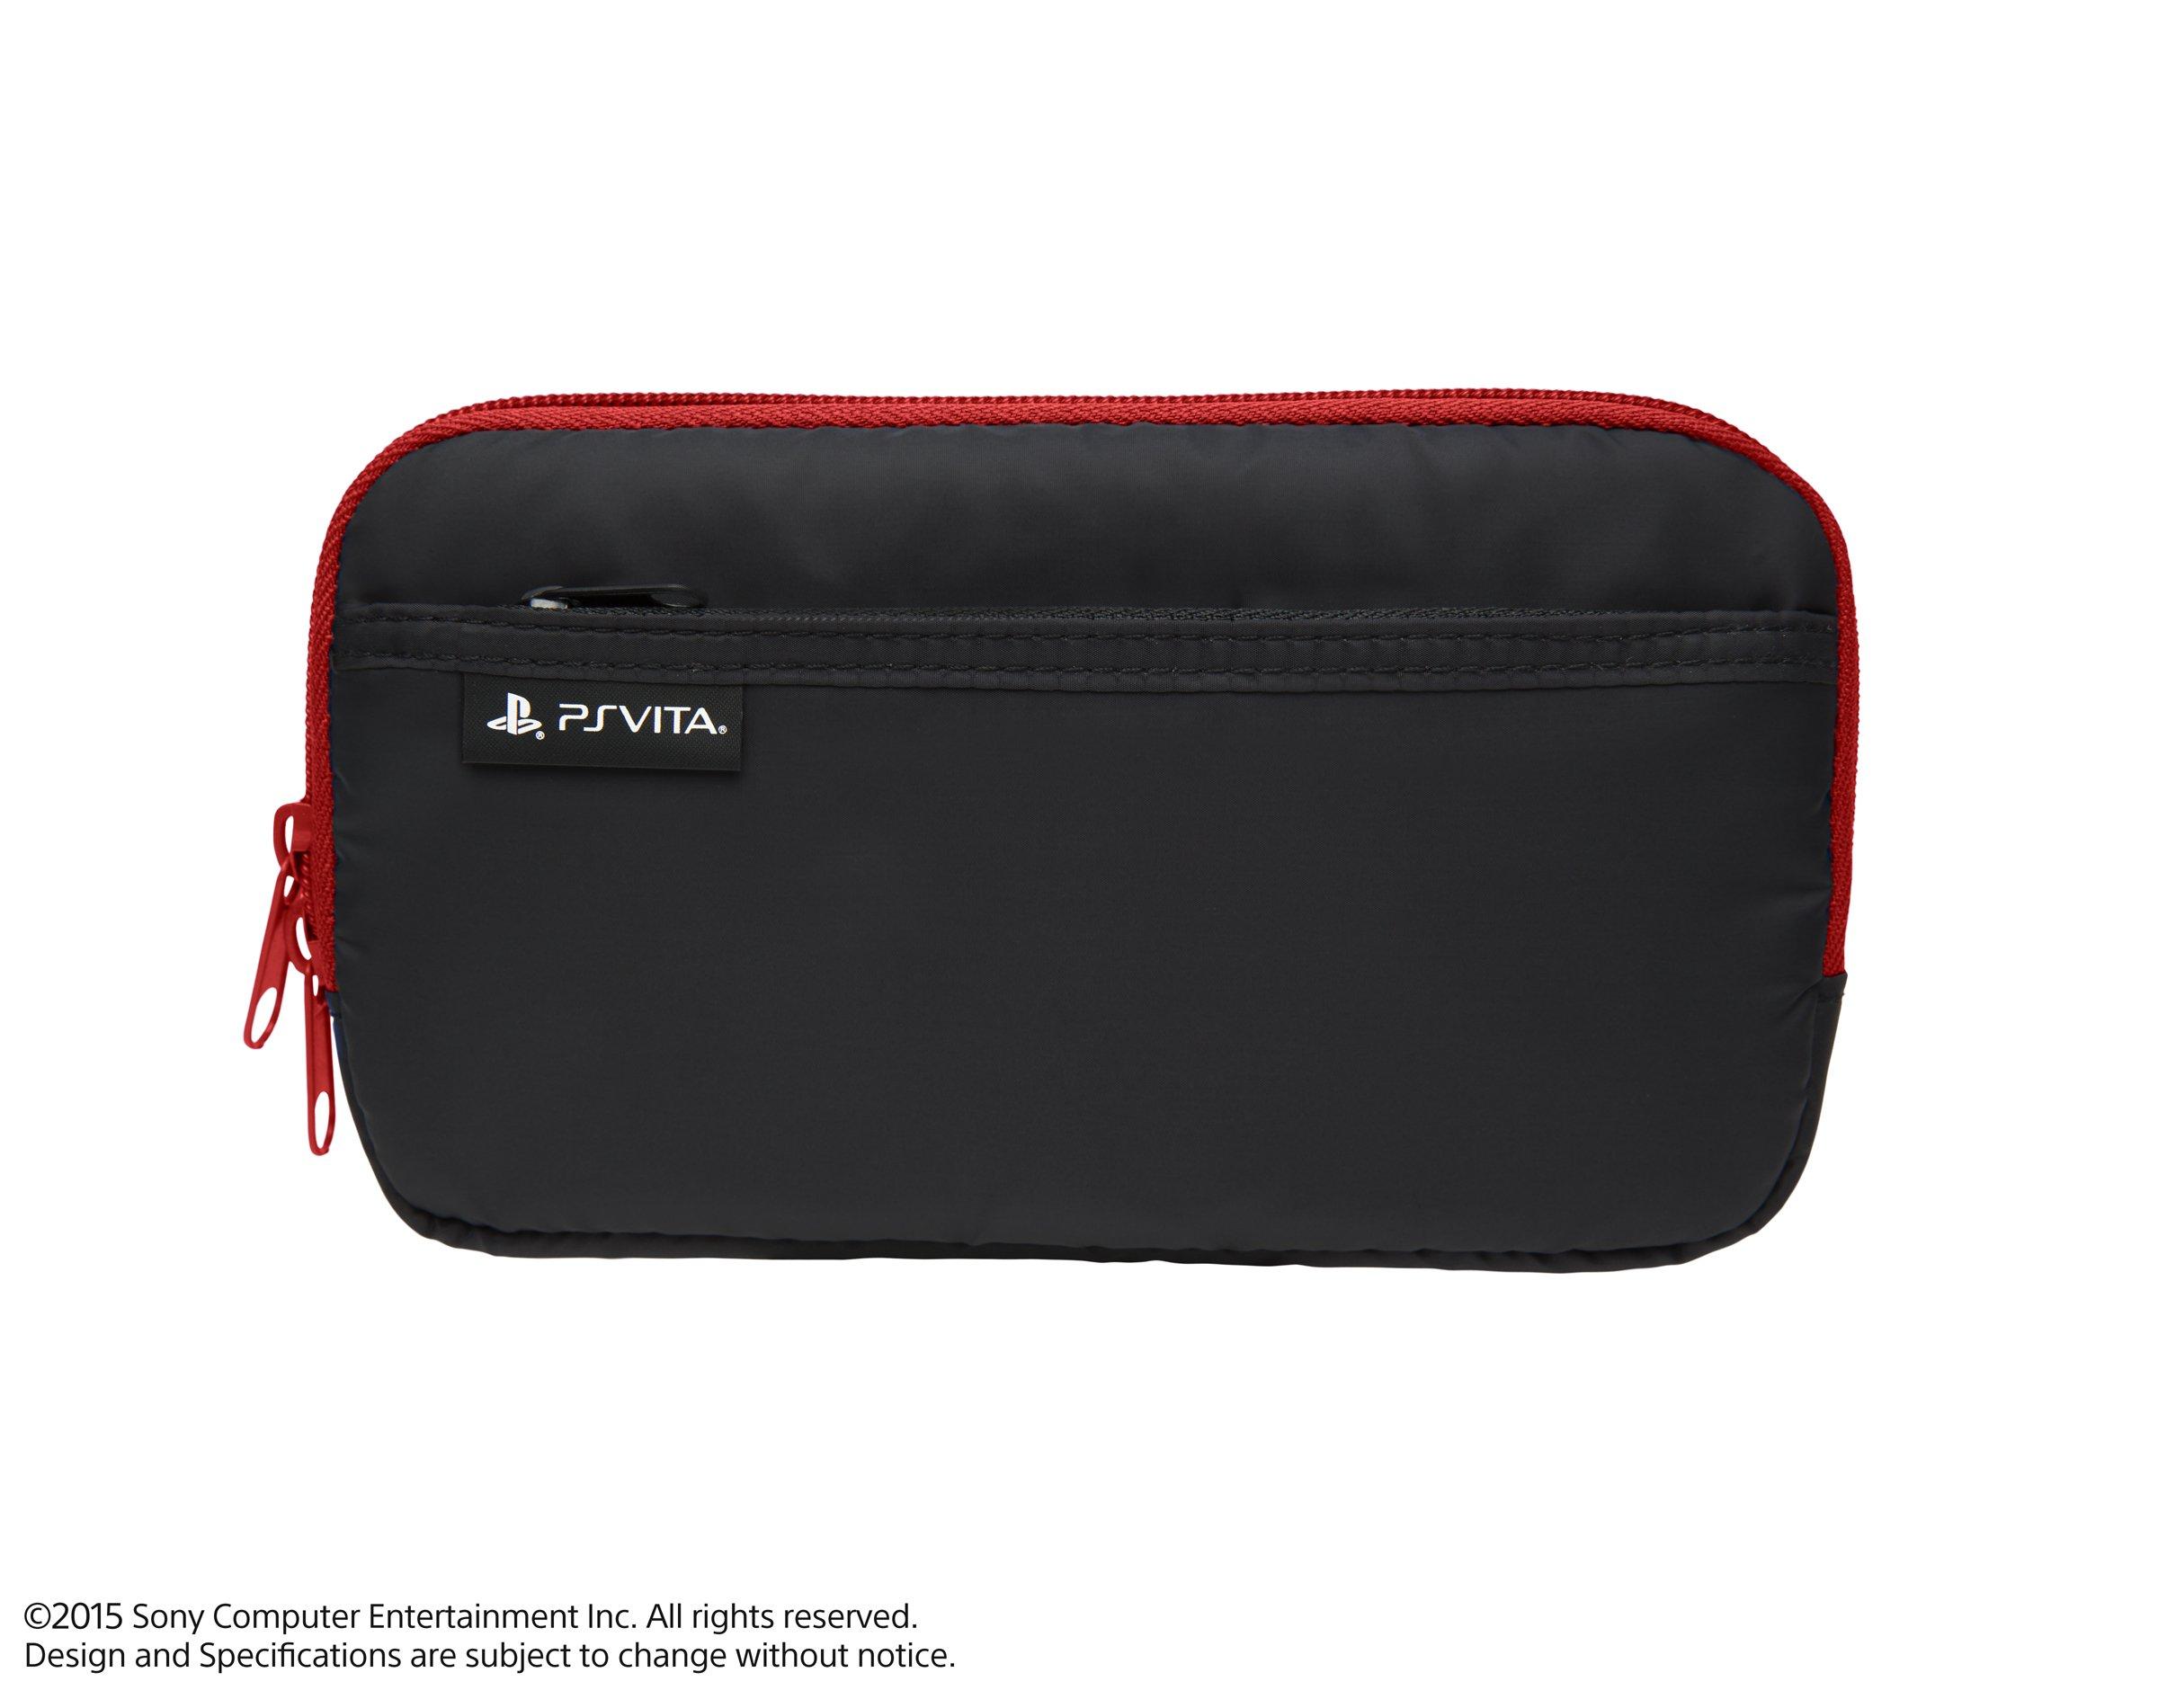 PlayStation Vita debut pack Wi-Fi model Red / Black